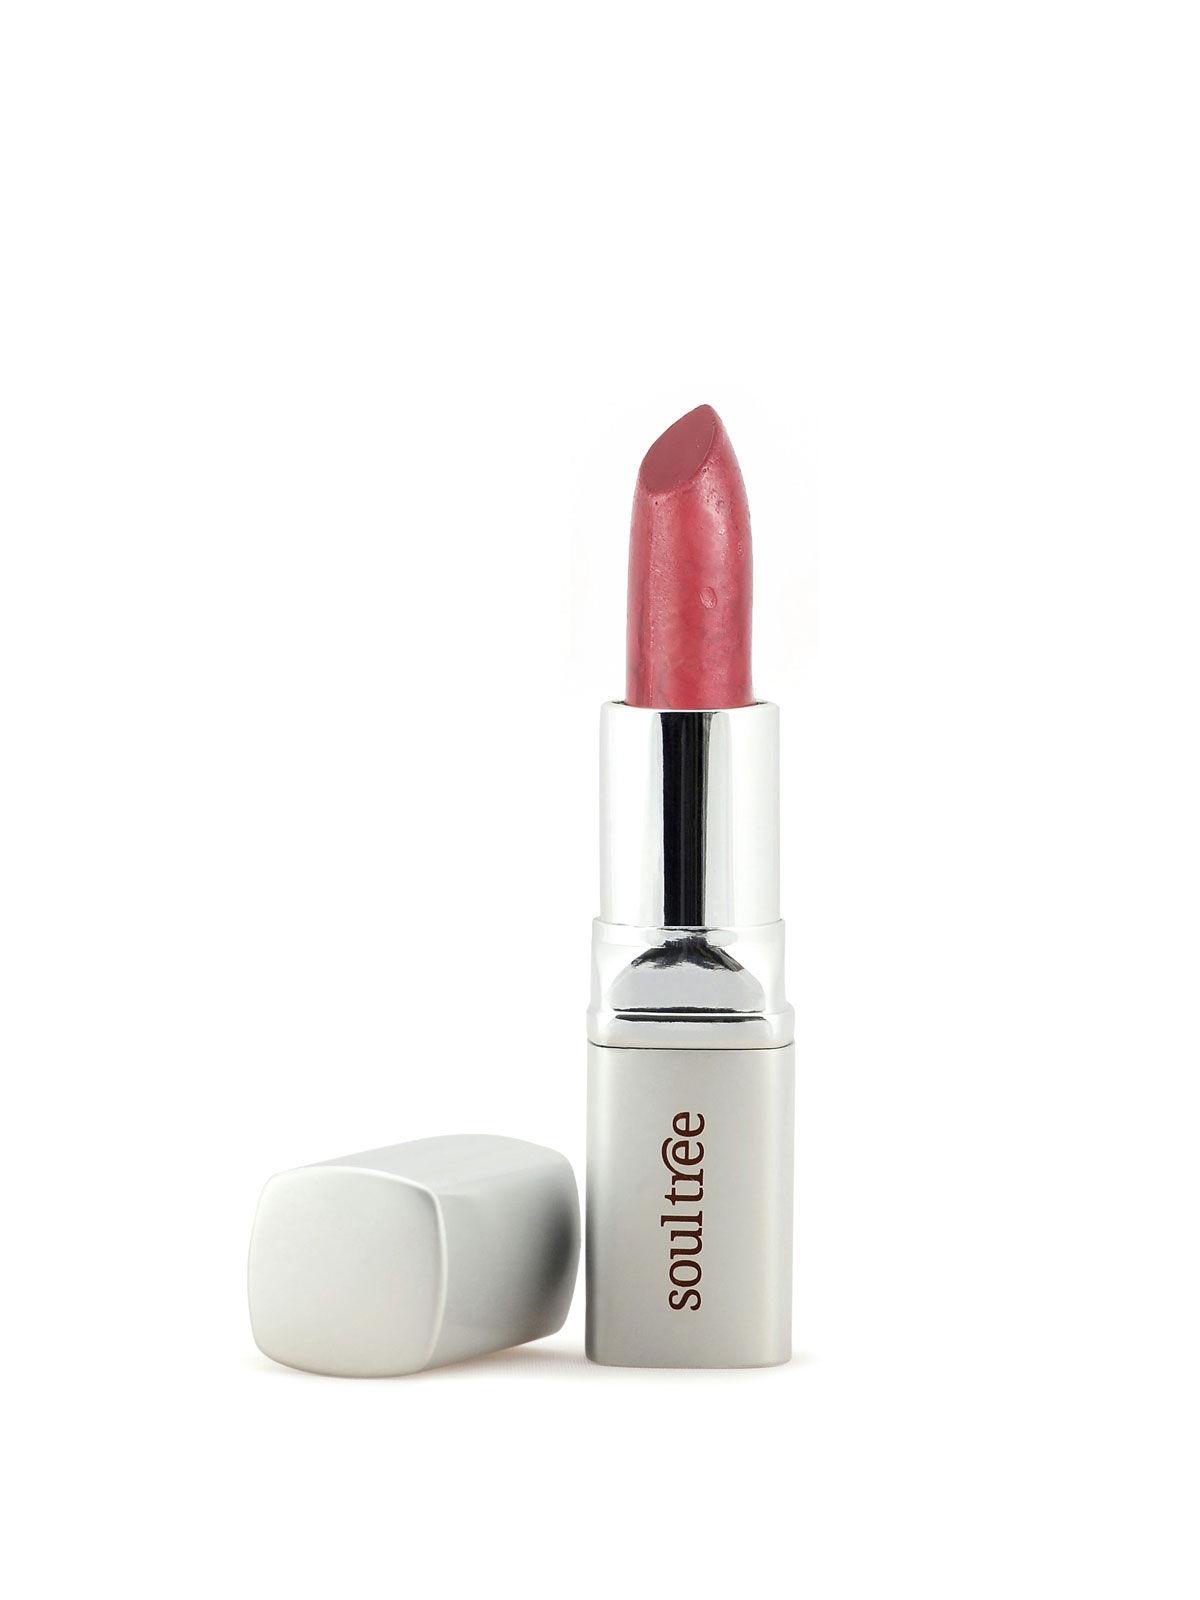 Soul Tree Lipstick Iced Plum 520